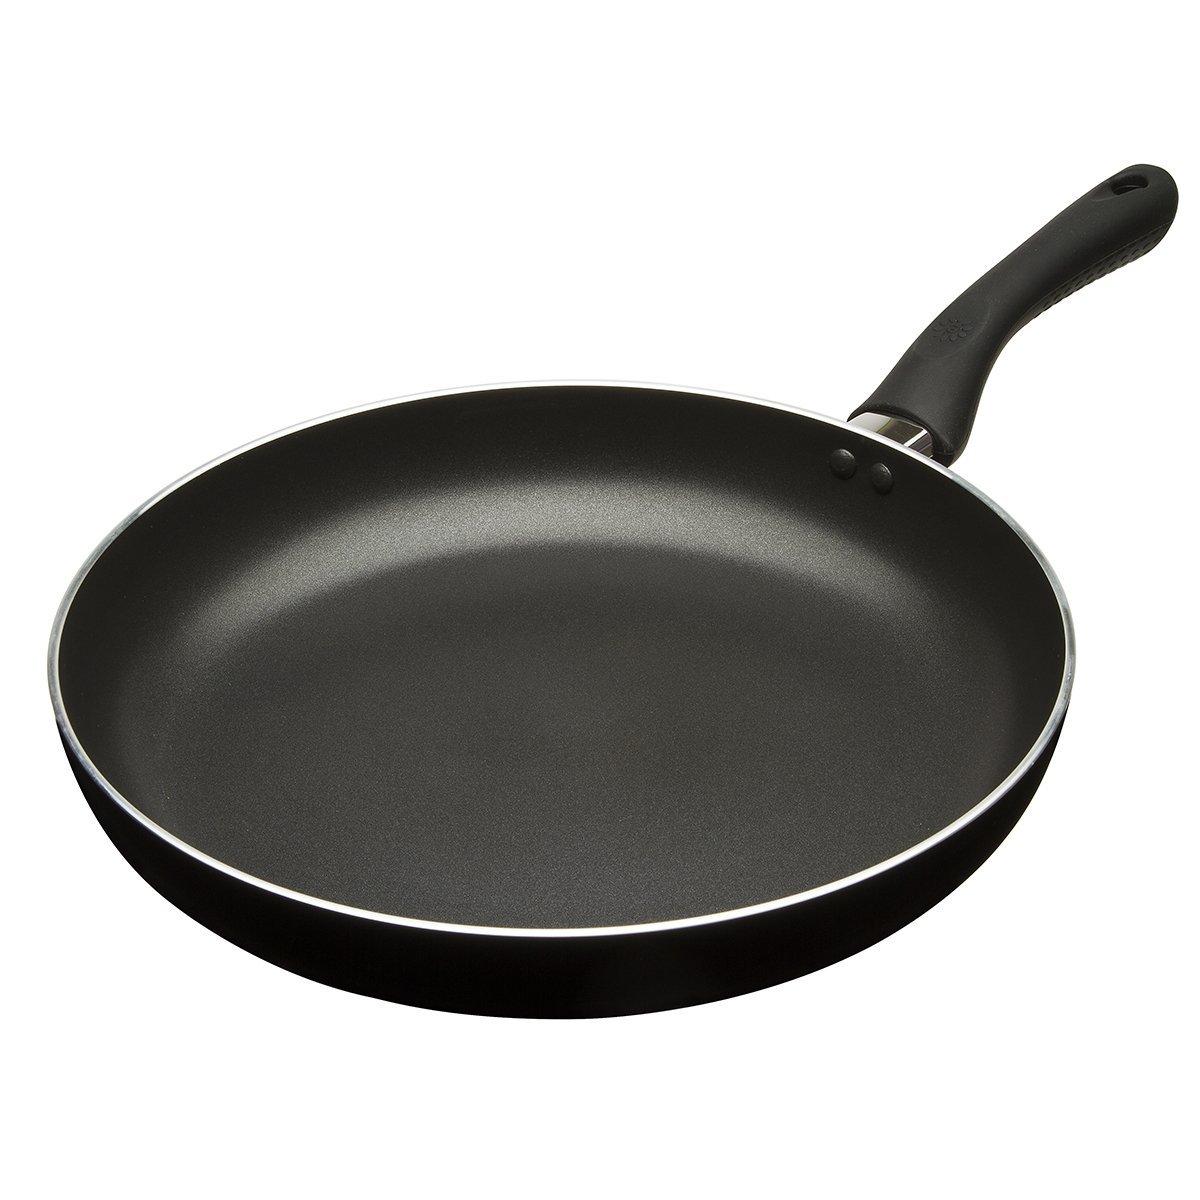 Ecolution Evolve Grande Fry Pan, 12.5-Inch, Black